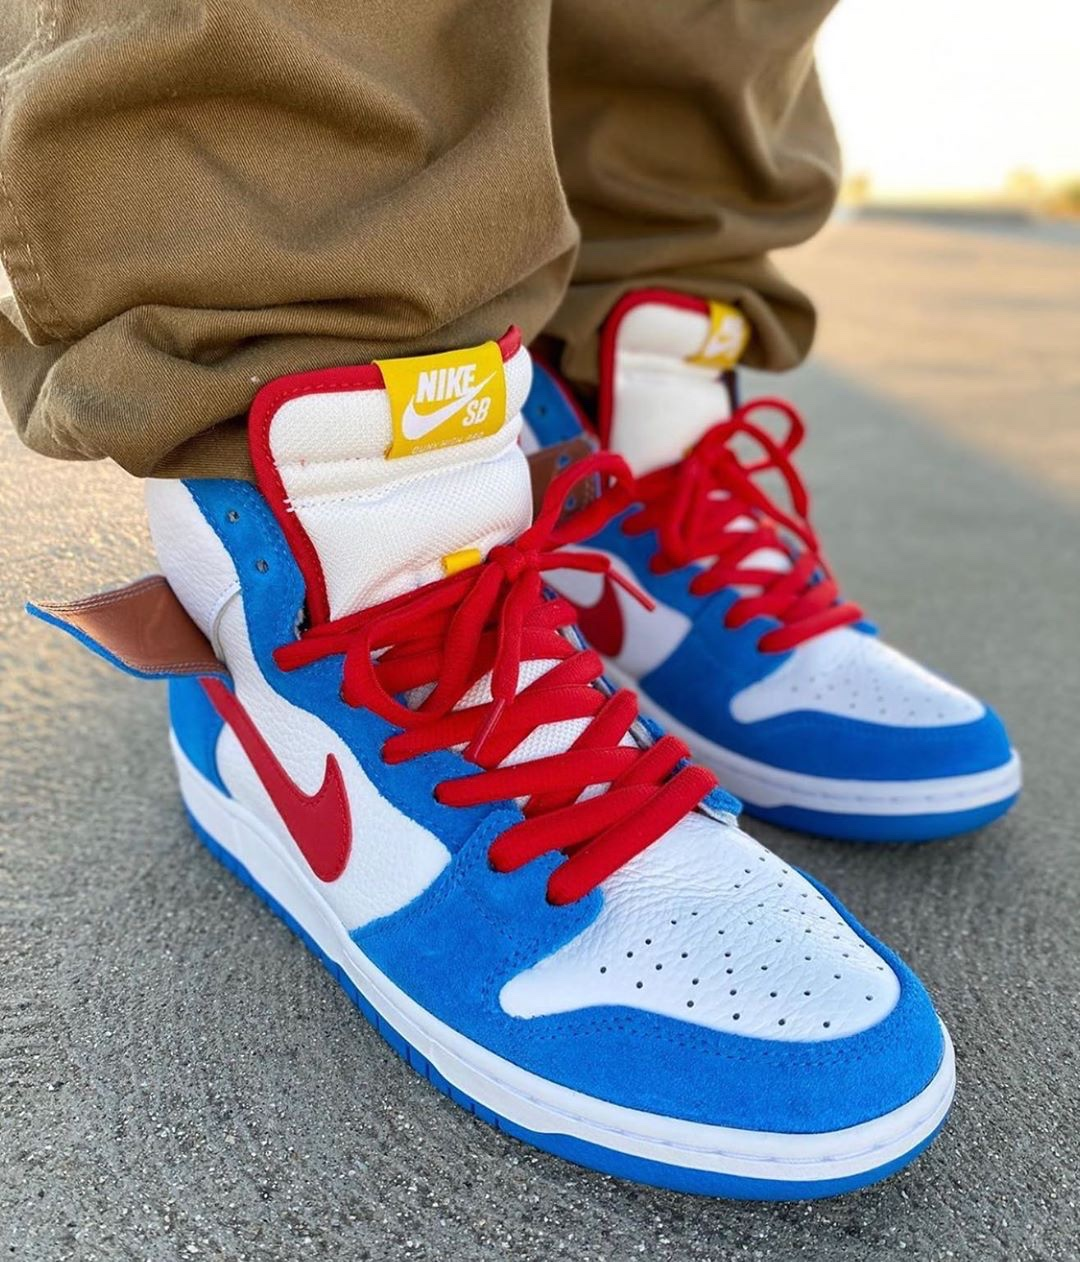 Nike SB Dunk High Doraemon blue e bianche